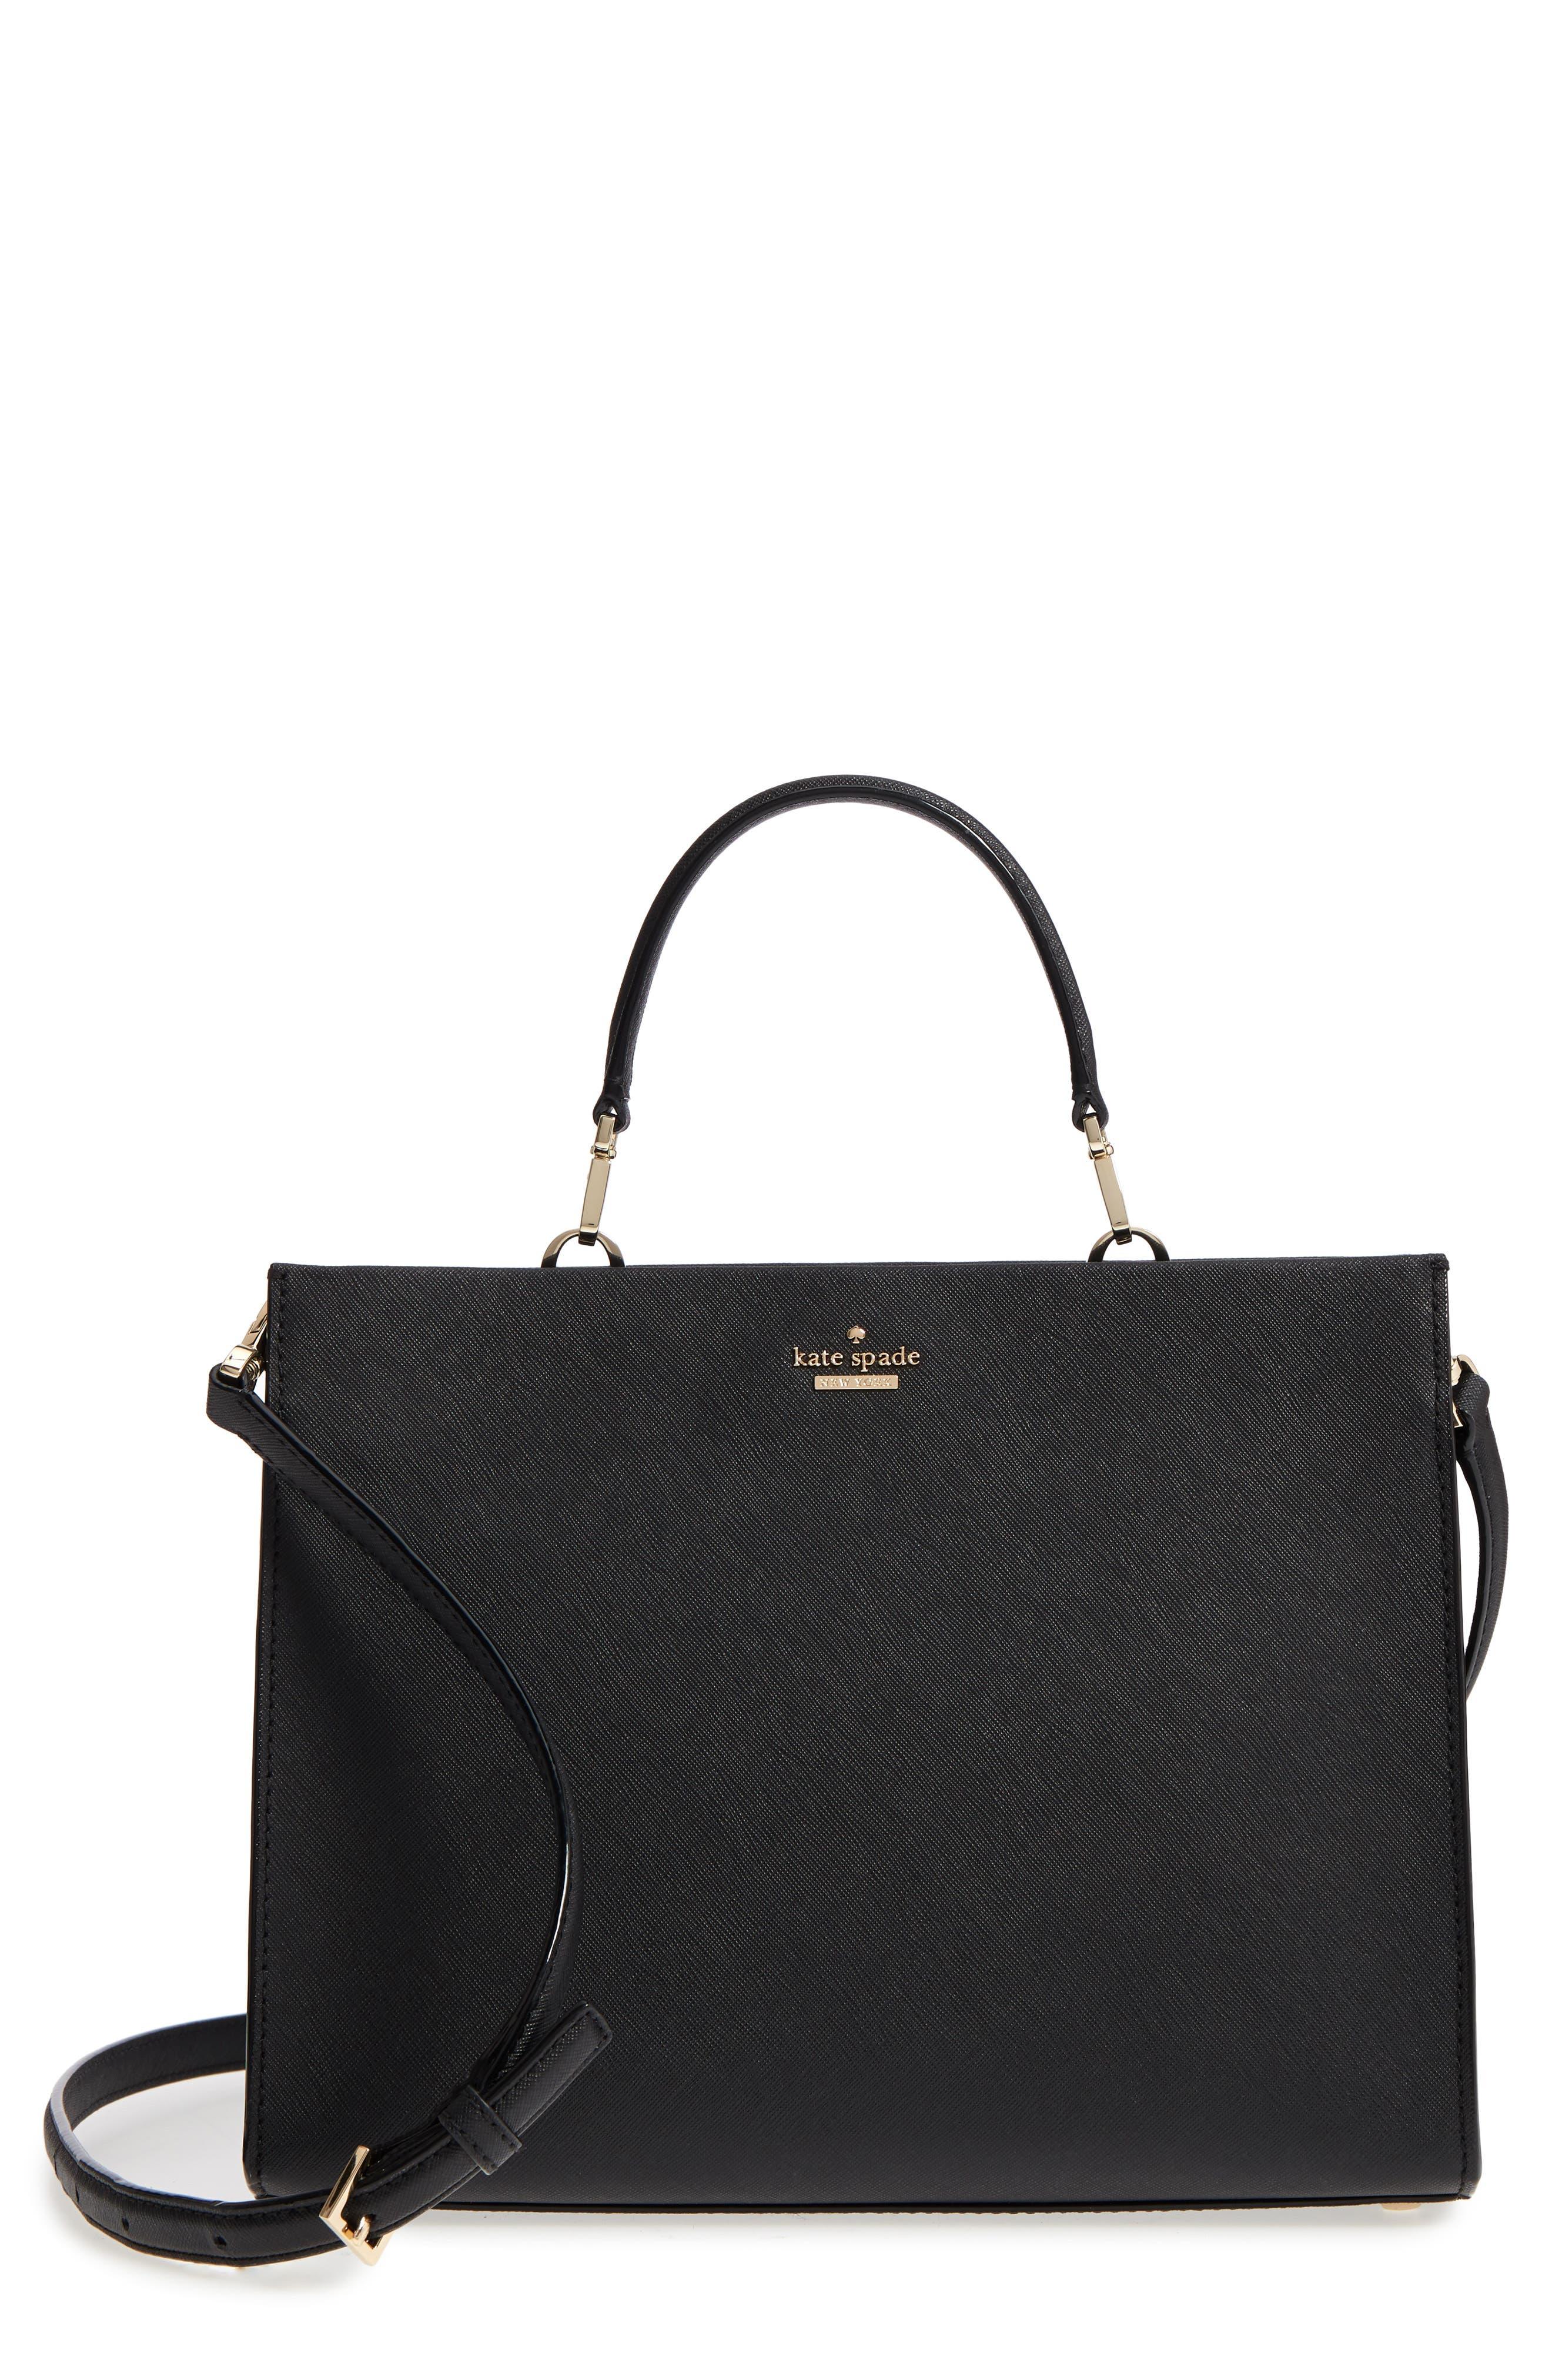 cameron street - sara leather satchel,                         Main,                         color, 001